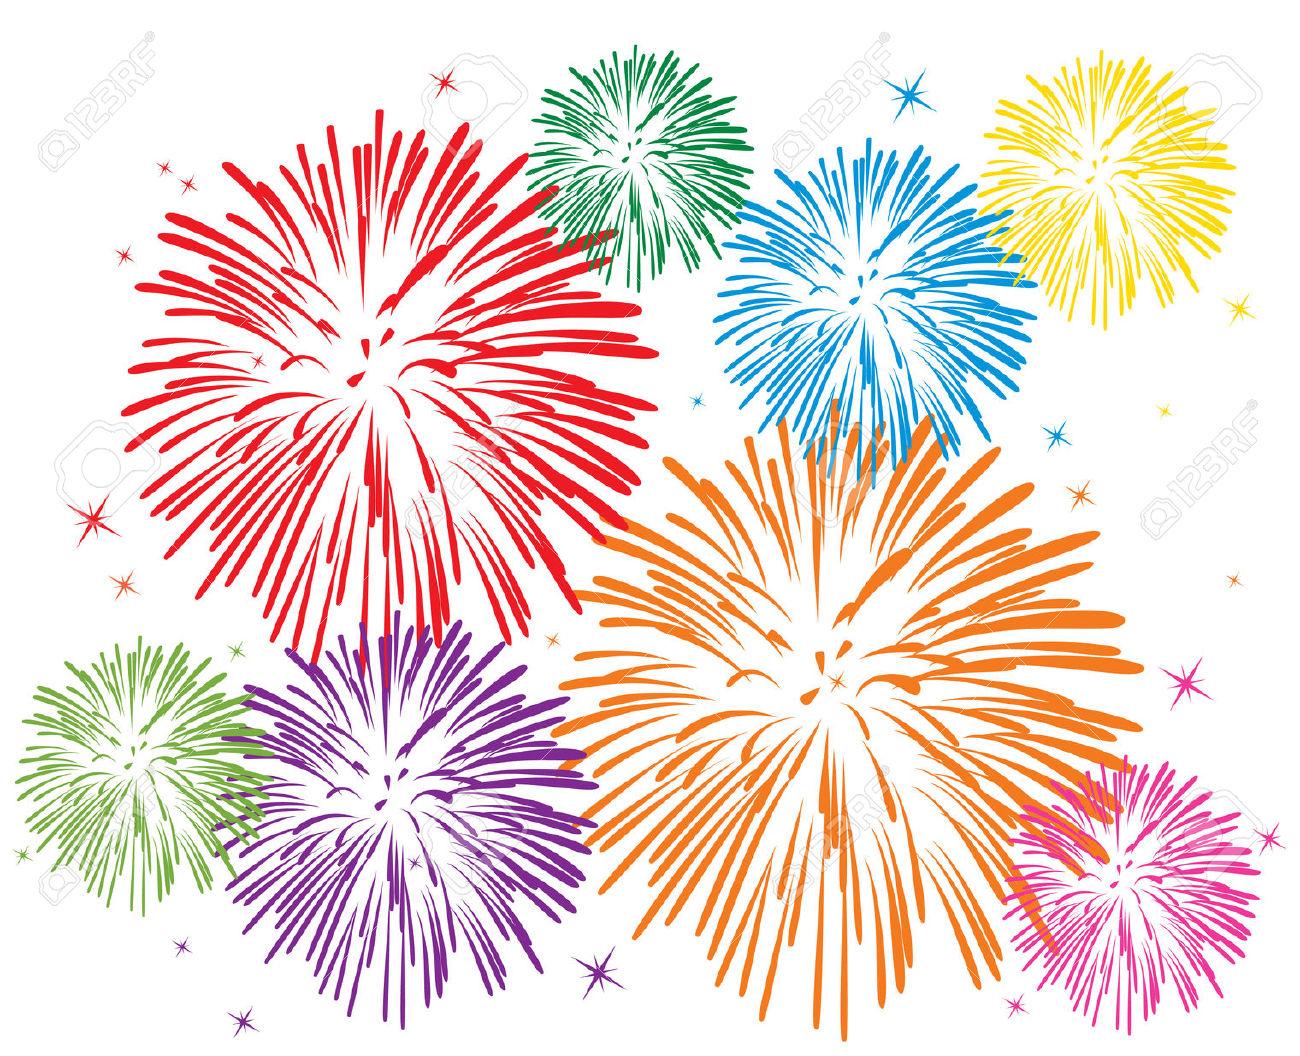 Fireworks clipart page 1-Fireworks clipart page 1-17